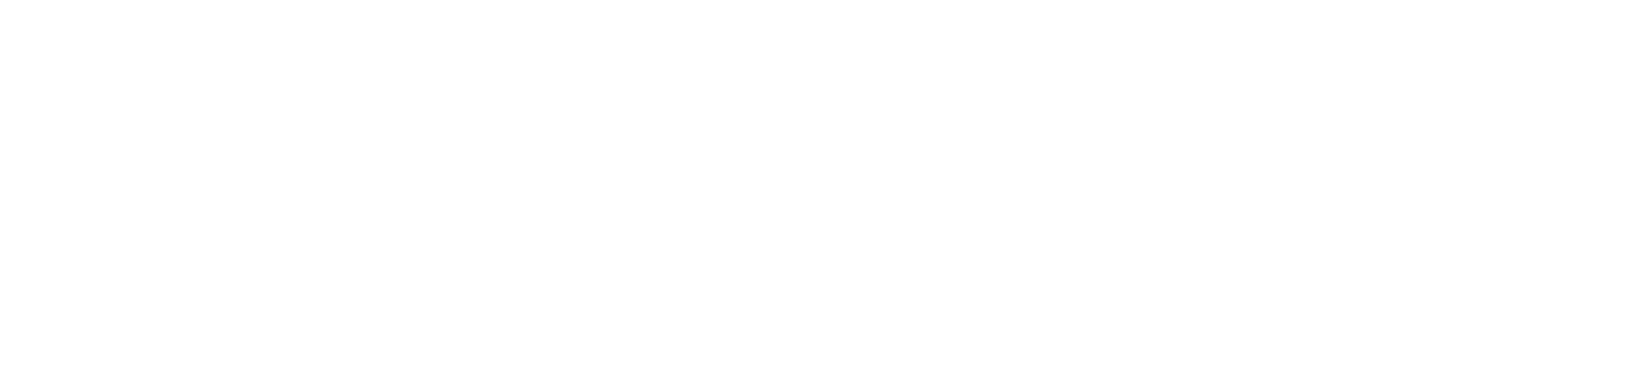 Modtek Media 3D Printing